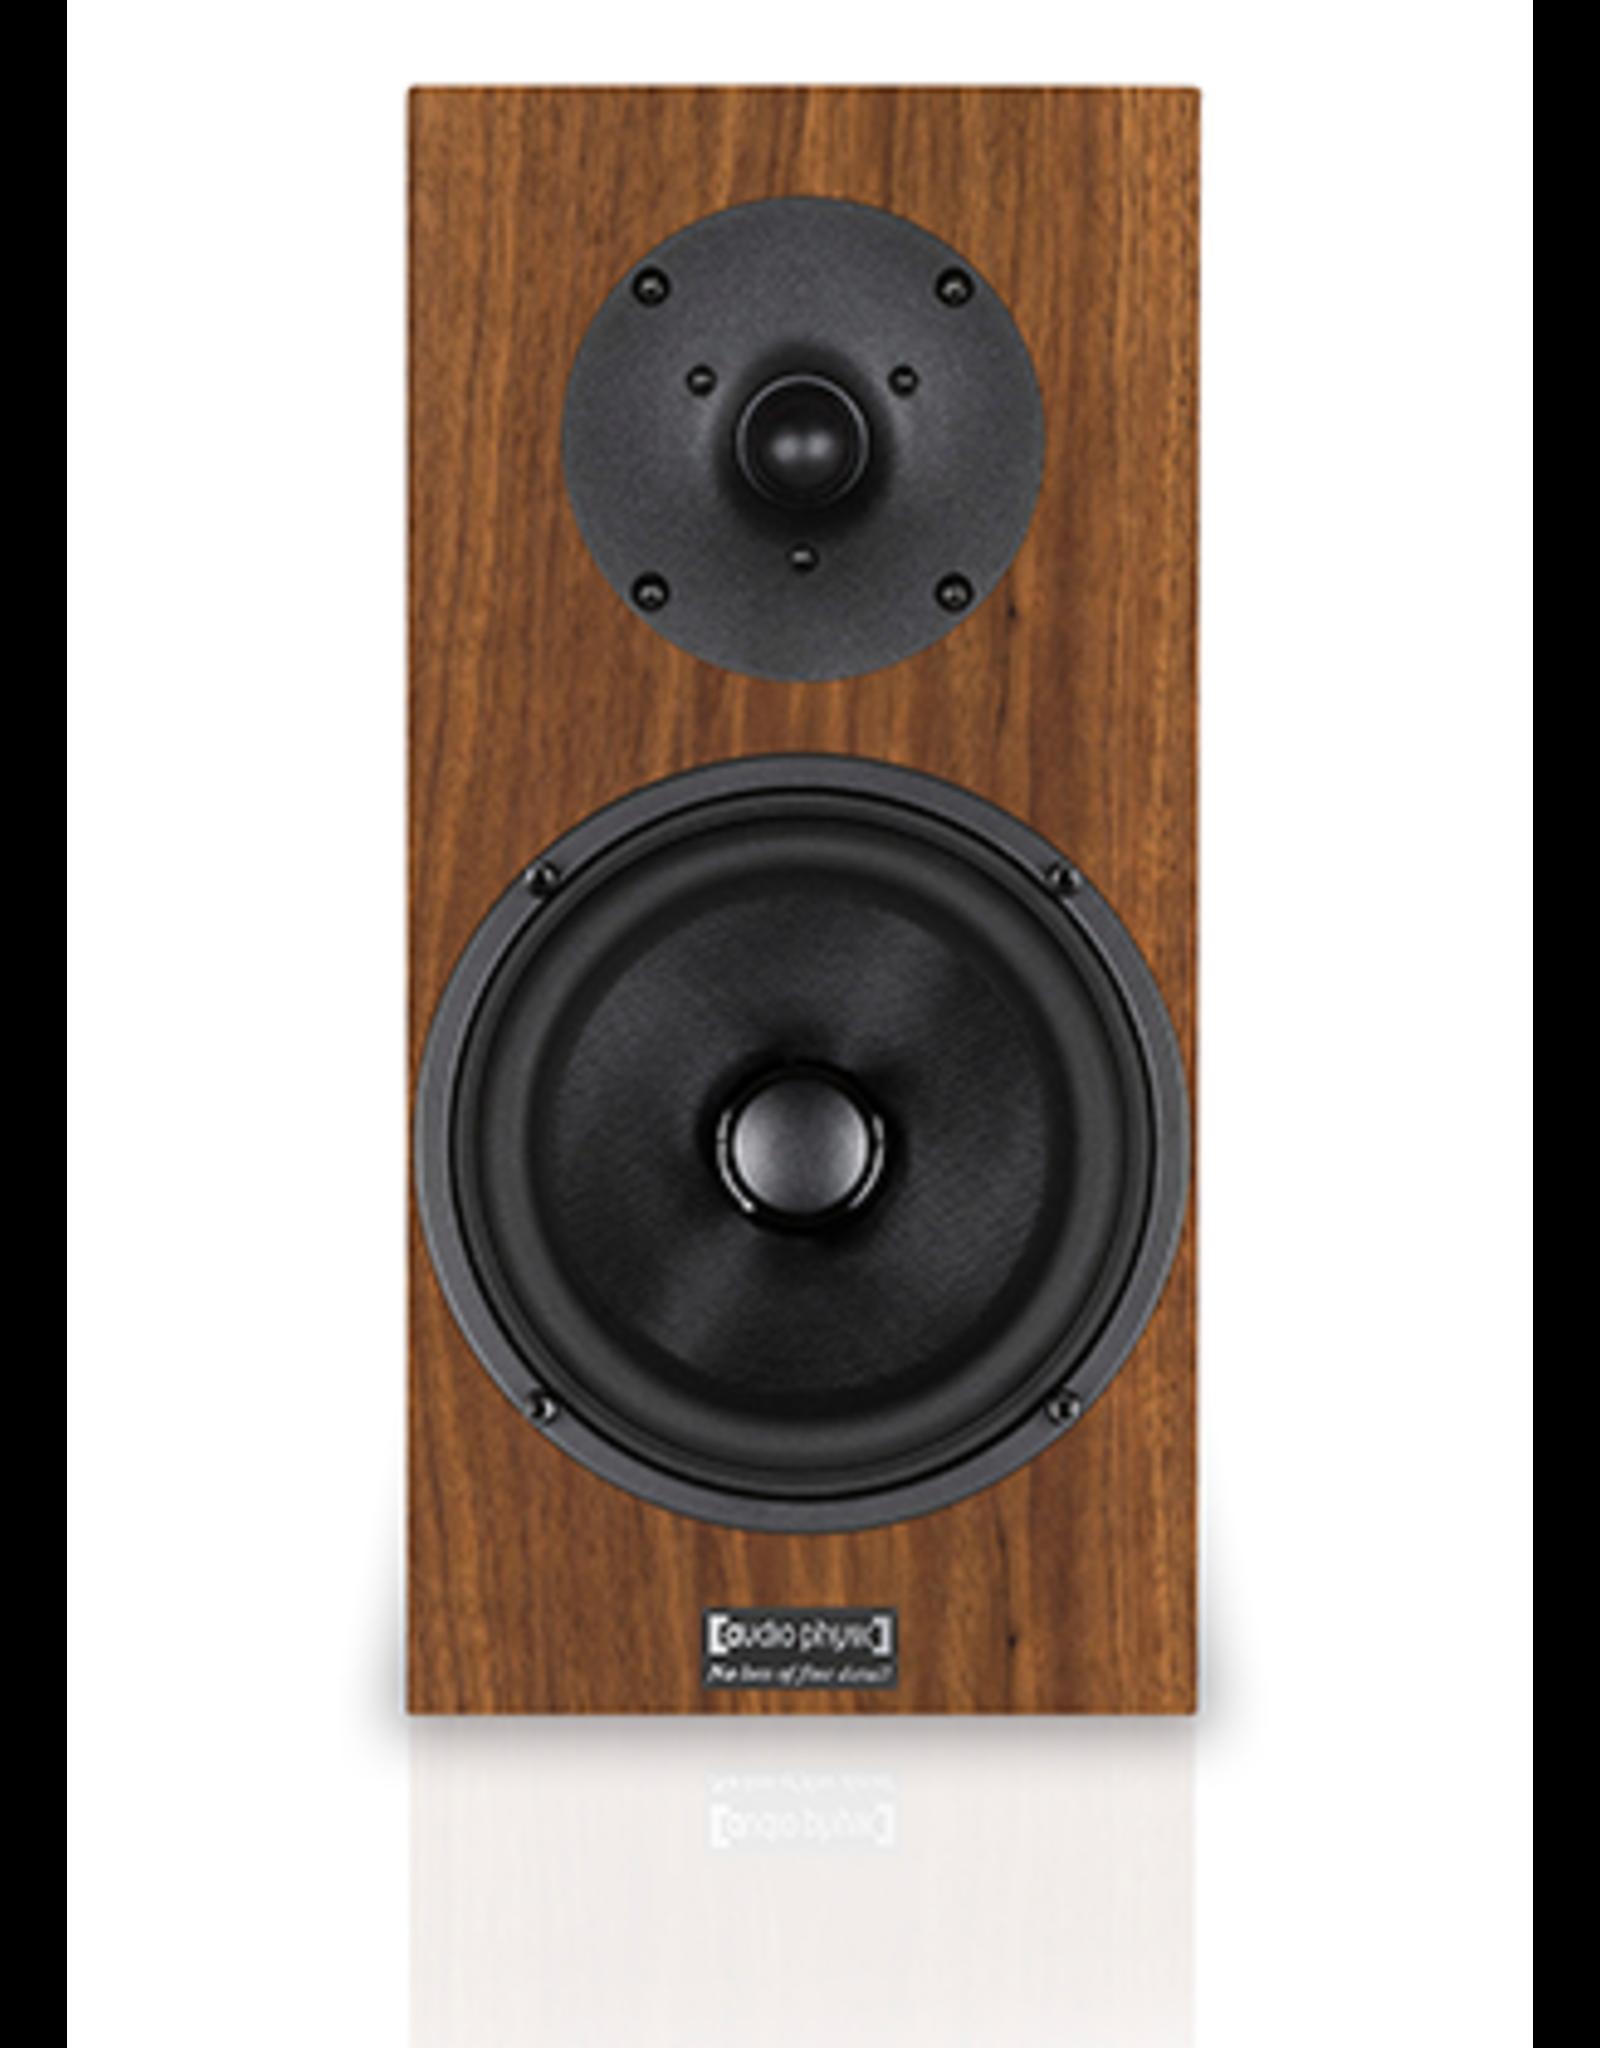 Audio Physic Audio Physic Classic 3 Bookshelf Speakers